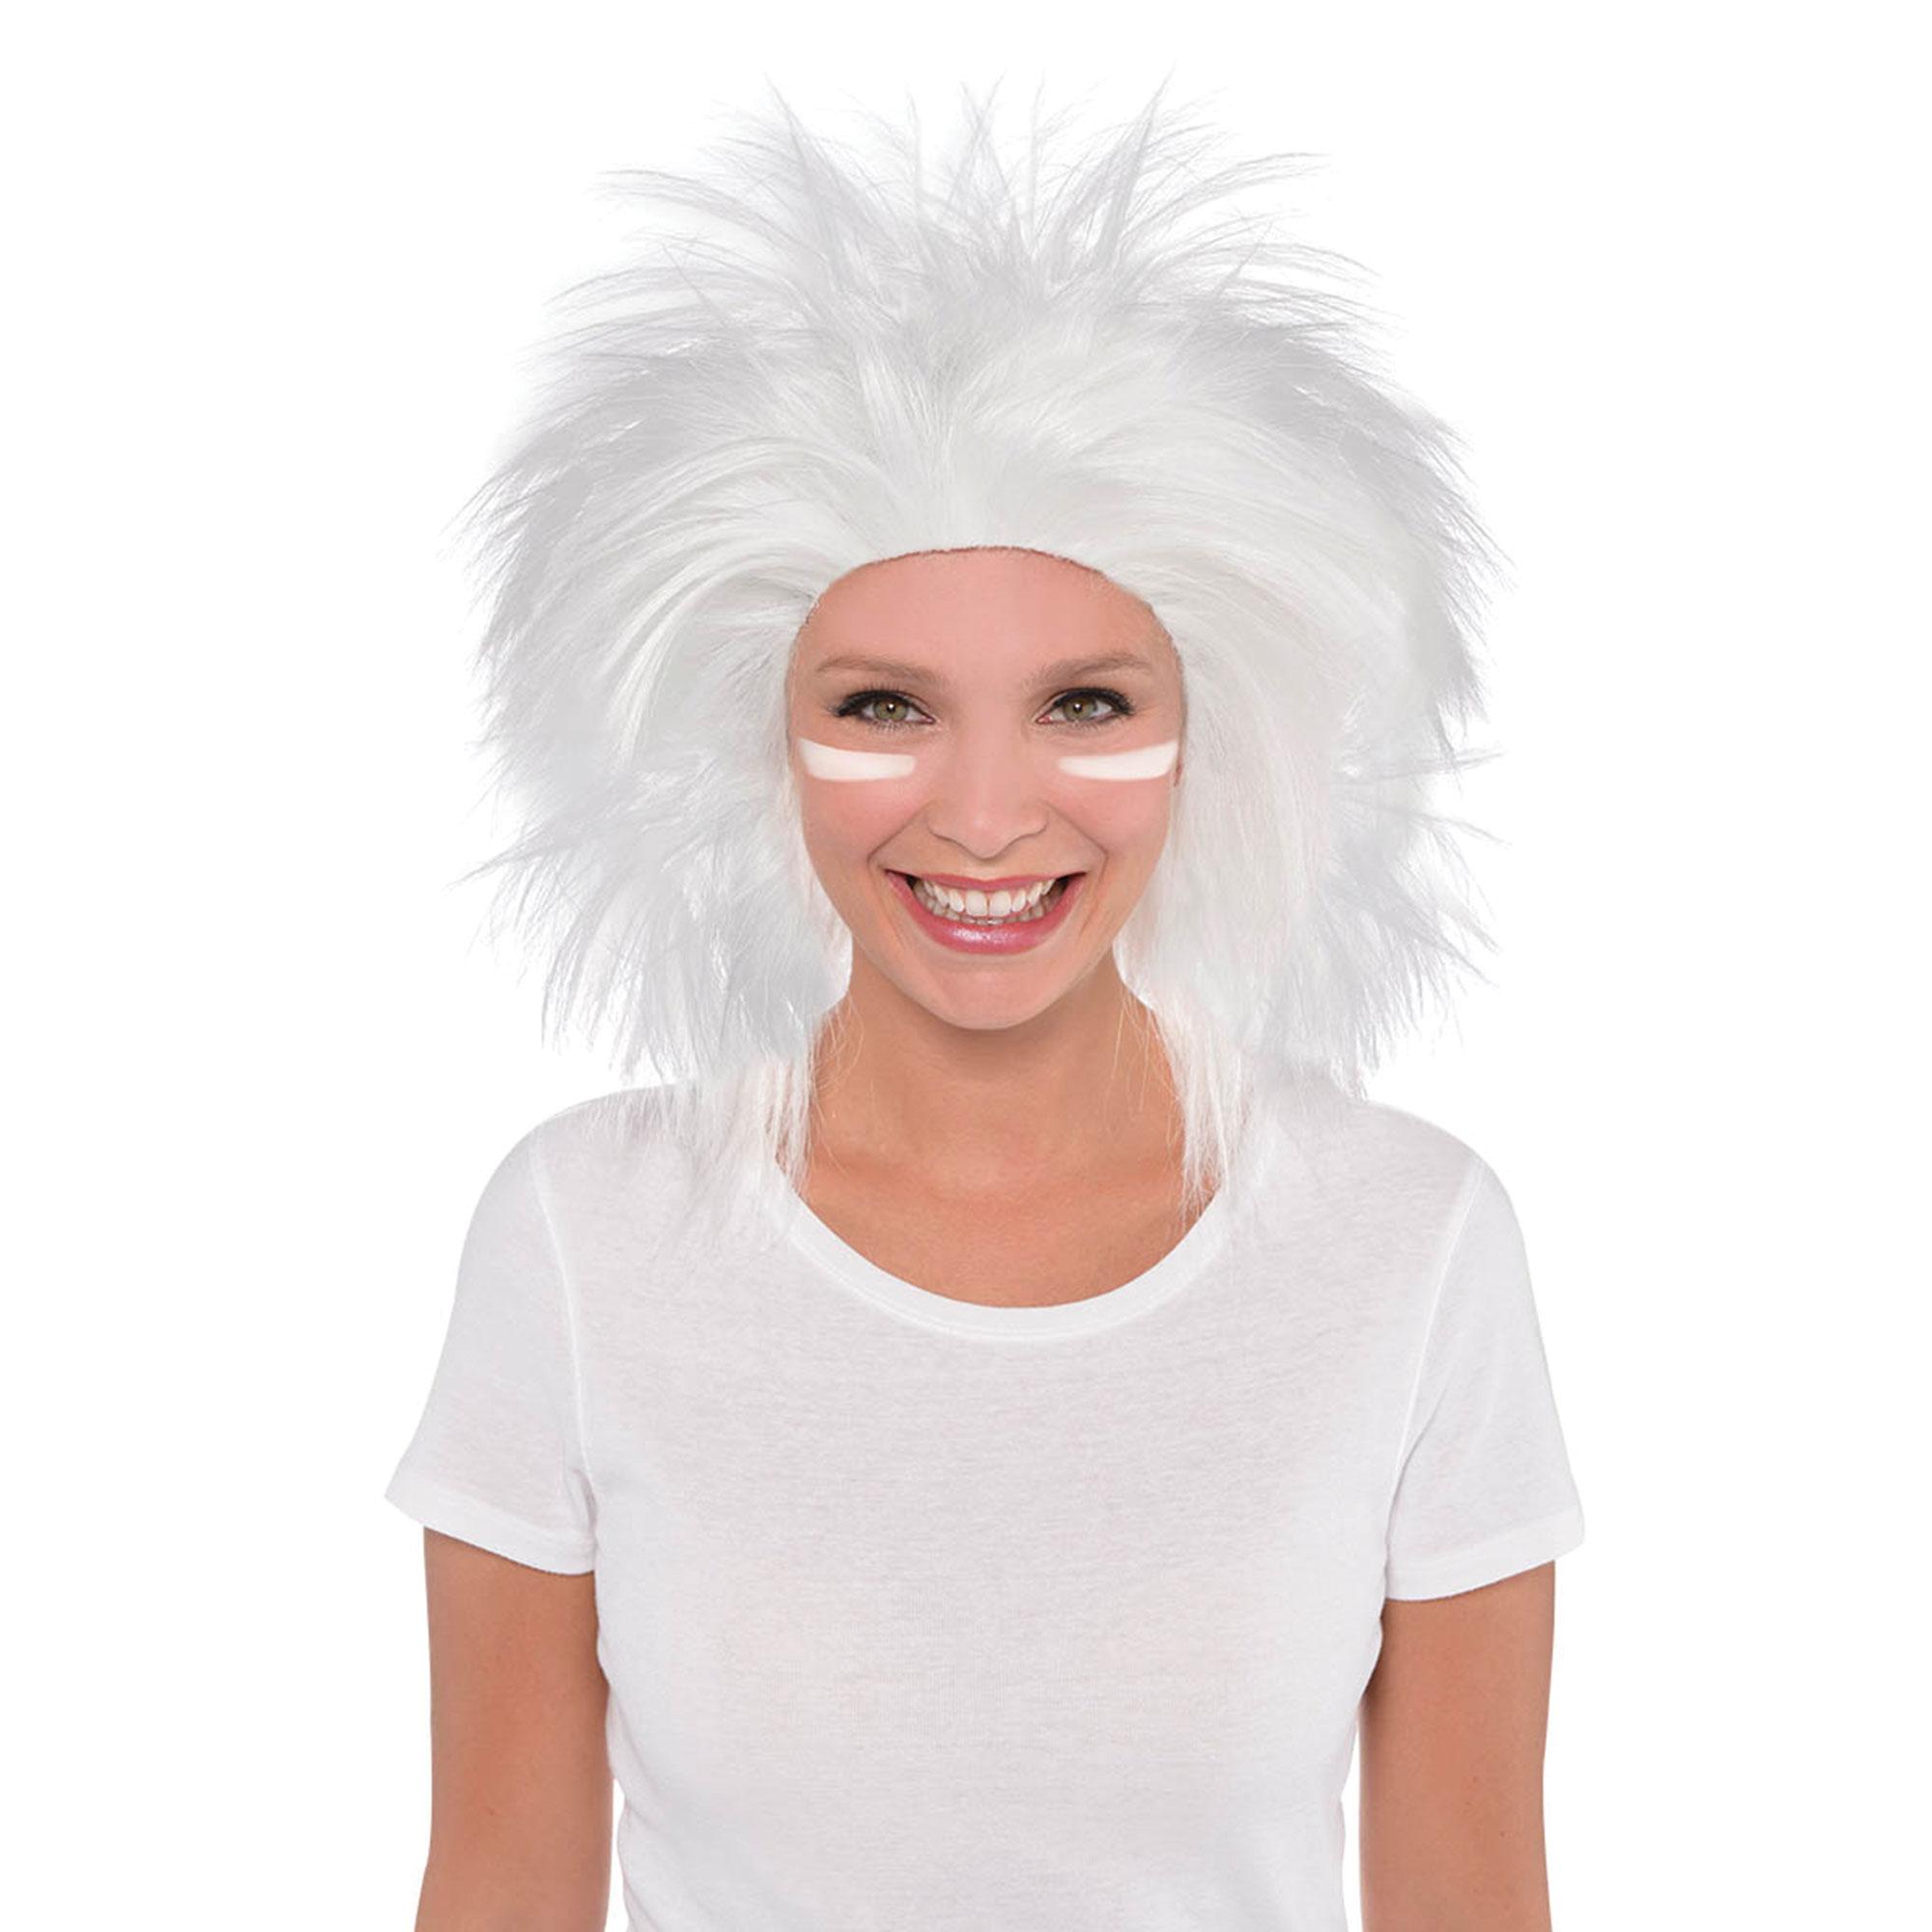 Crazy Wig - White